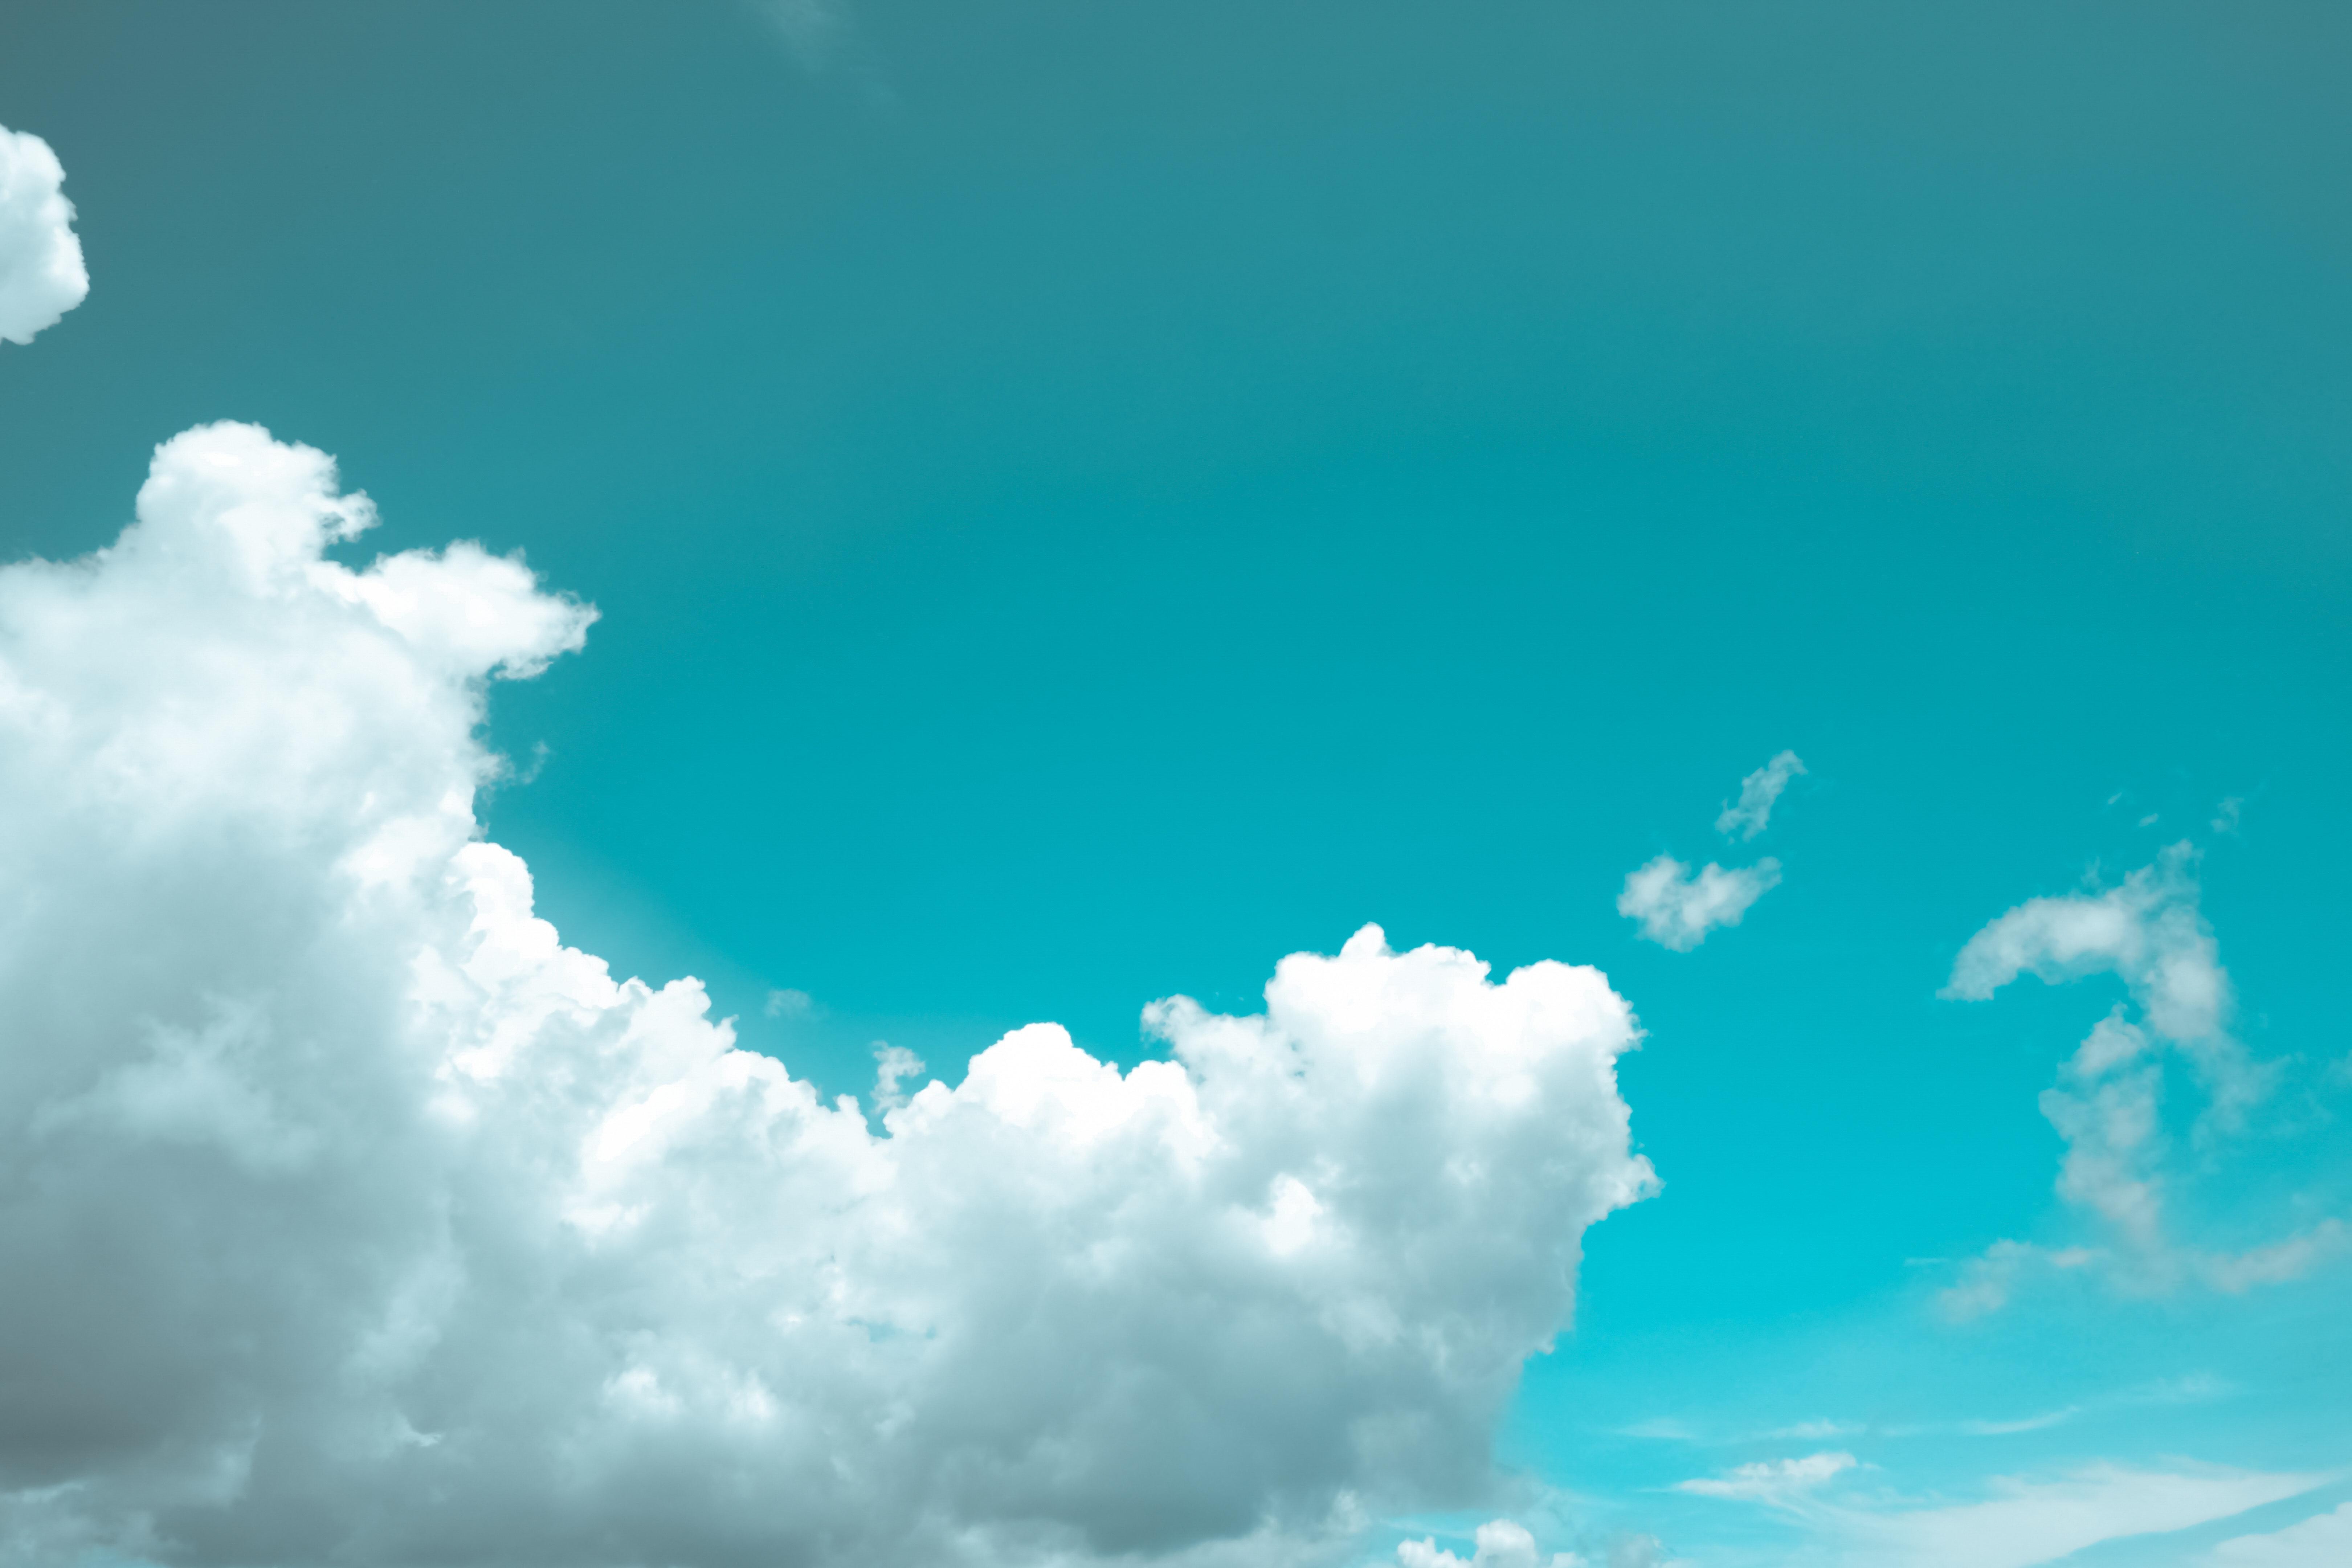 Sky Png Images Hd | Djiwallpaper co